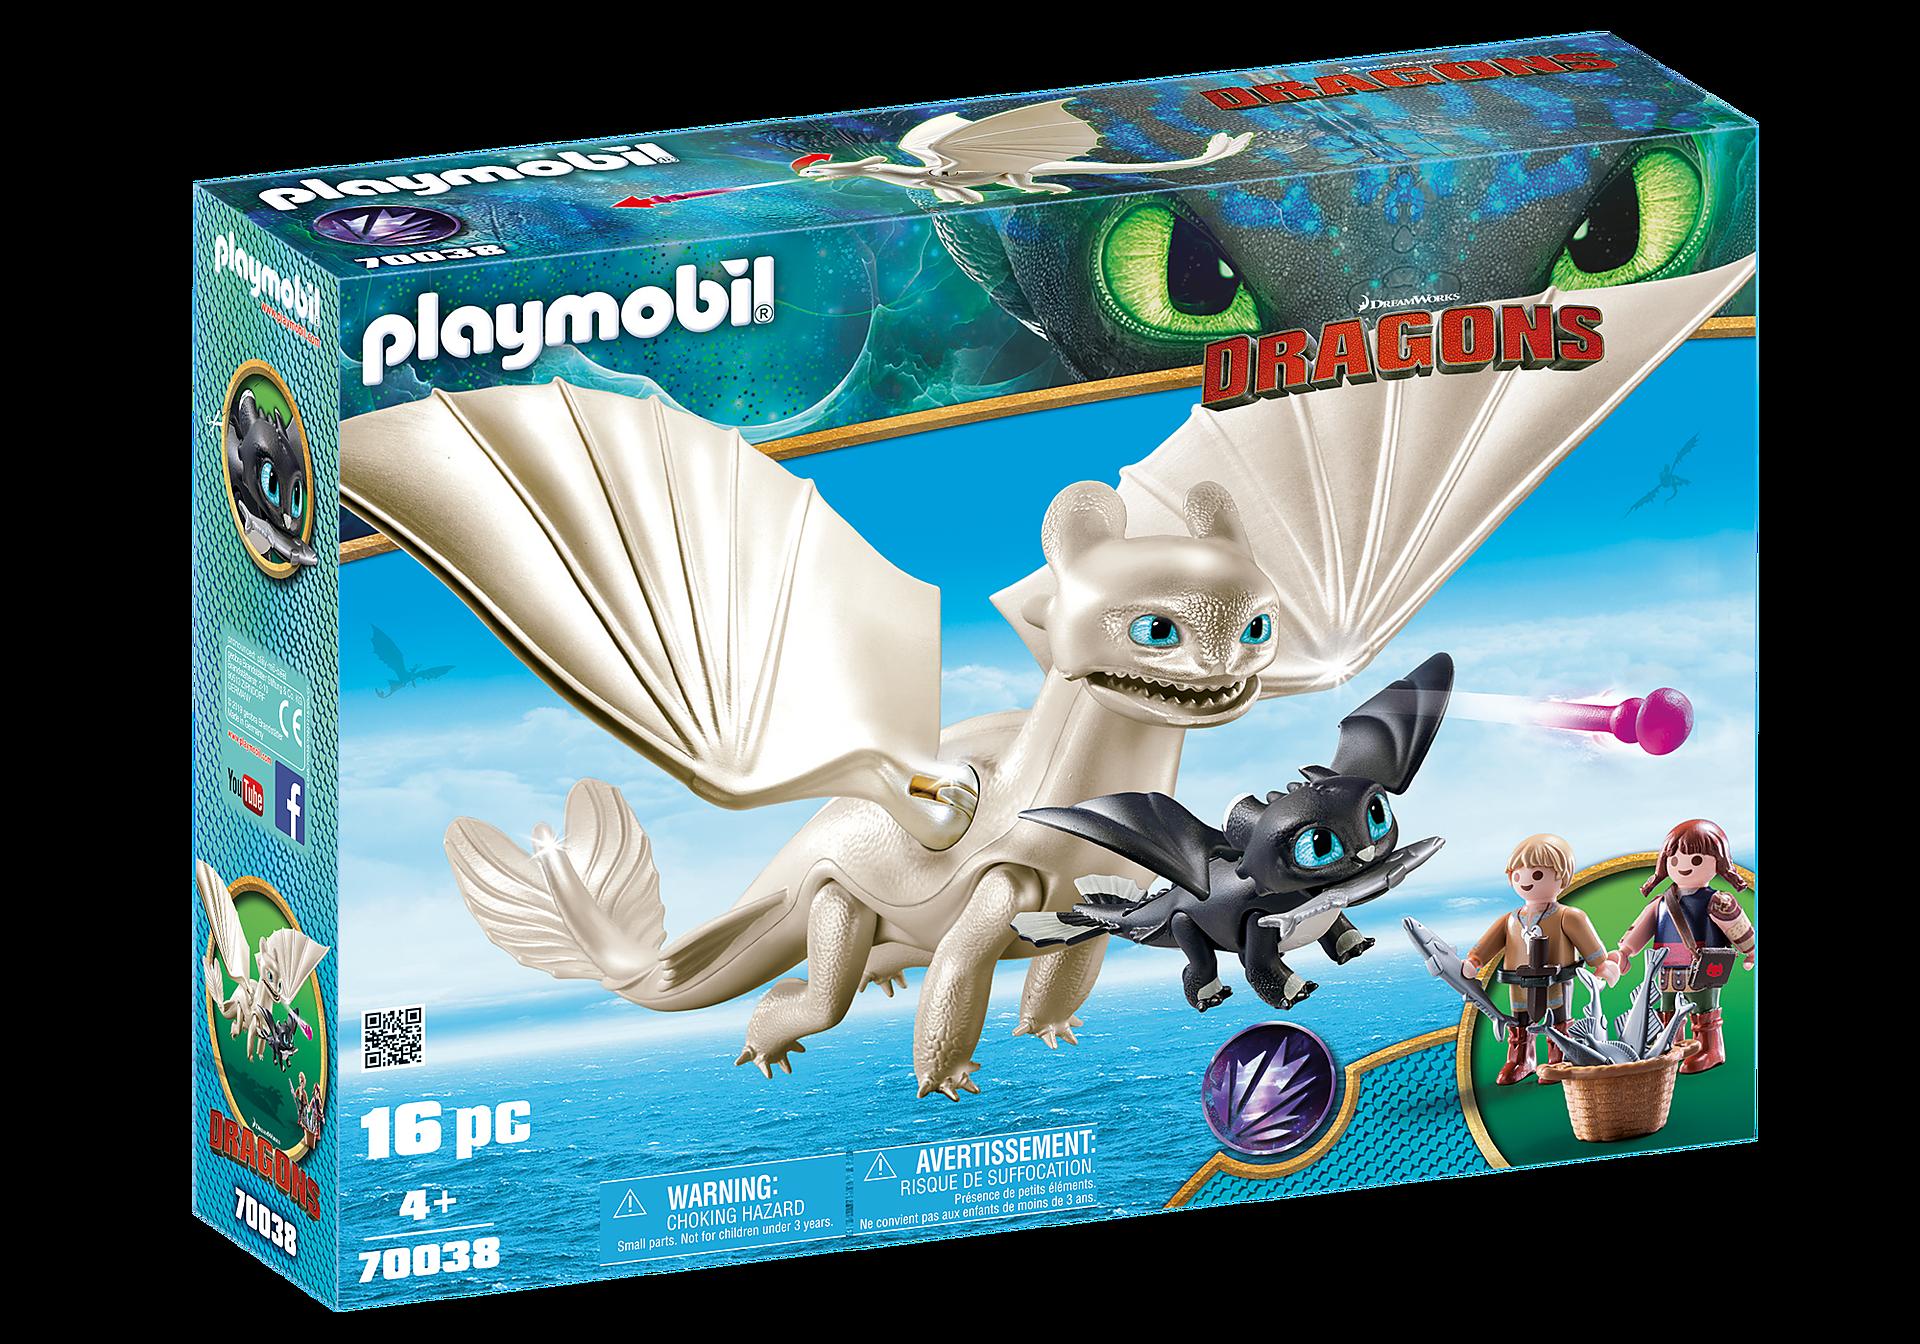 http://media.playmobil.com/i/playmobil/70038_product_box_front/Tagschatten und Kinder mit Babydrachen